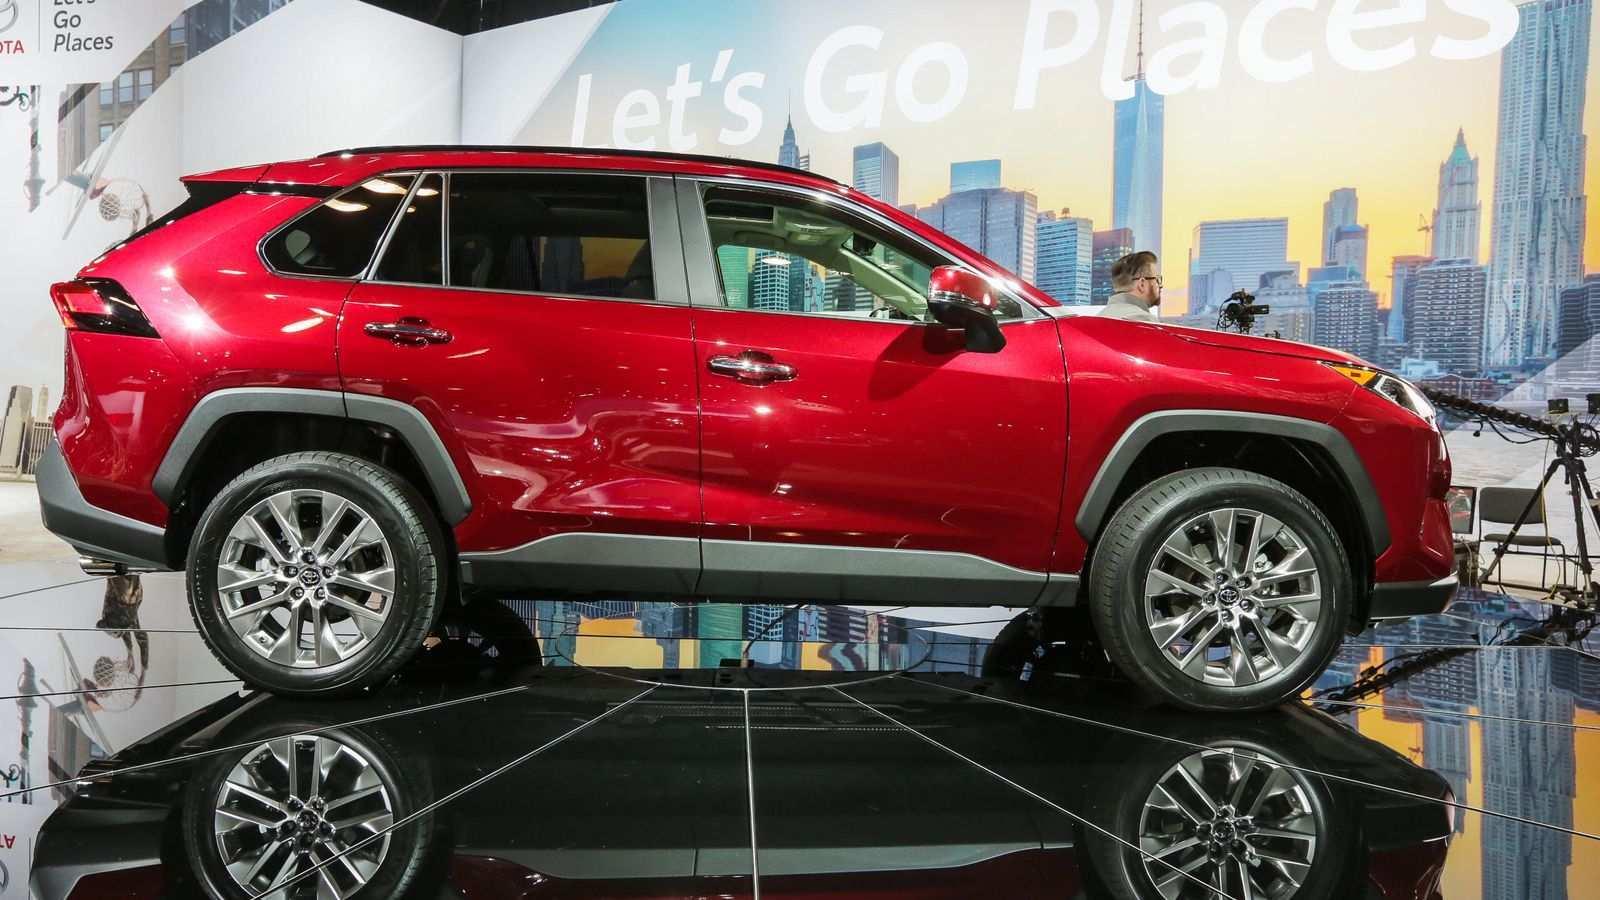 51 Best Review Crv Toyota 2020 Spesification for Crv Toyota 2020